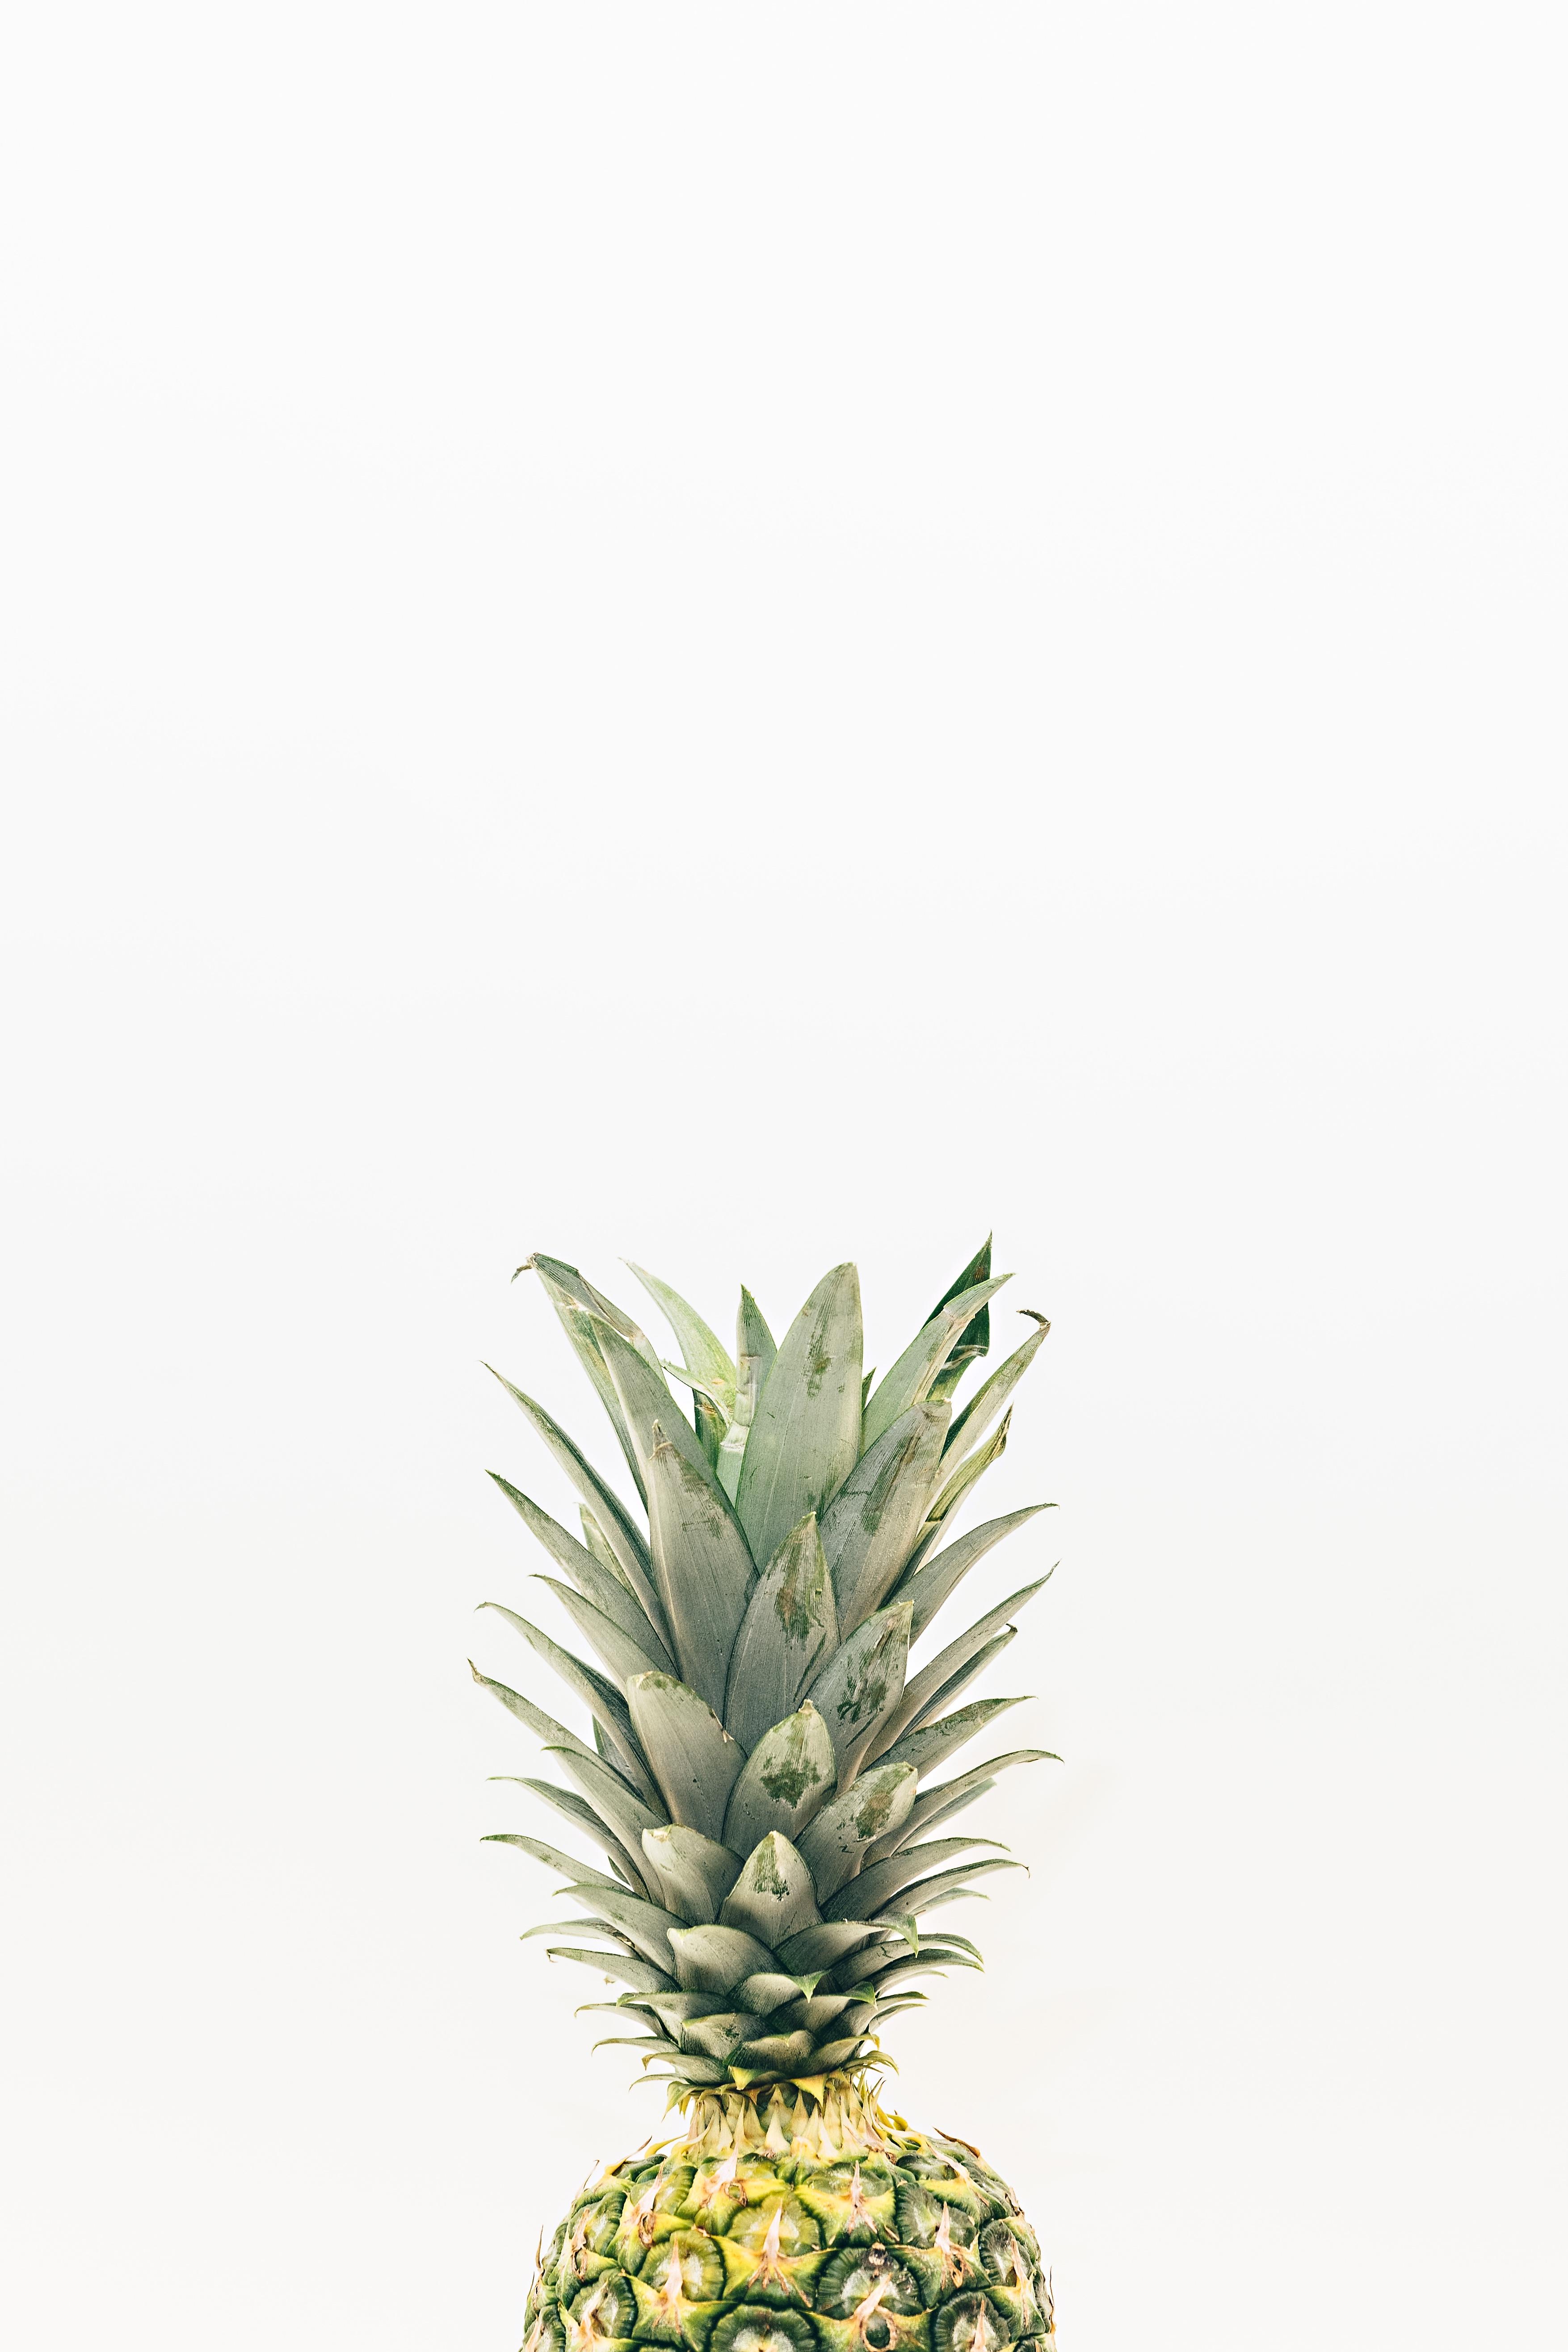 Bakgrundsbilder Gren Frukt Mat Producera Ananas